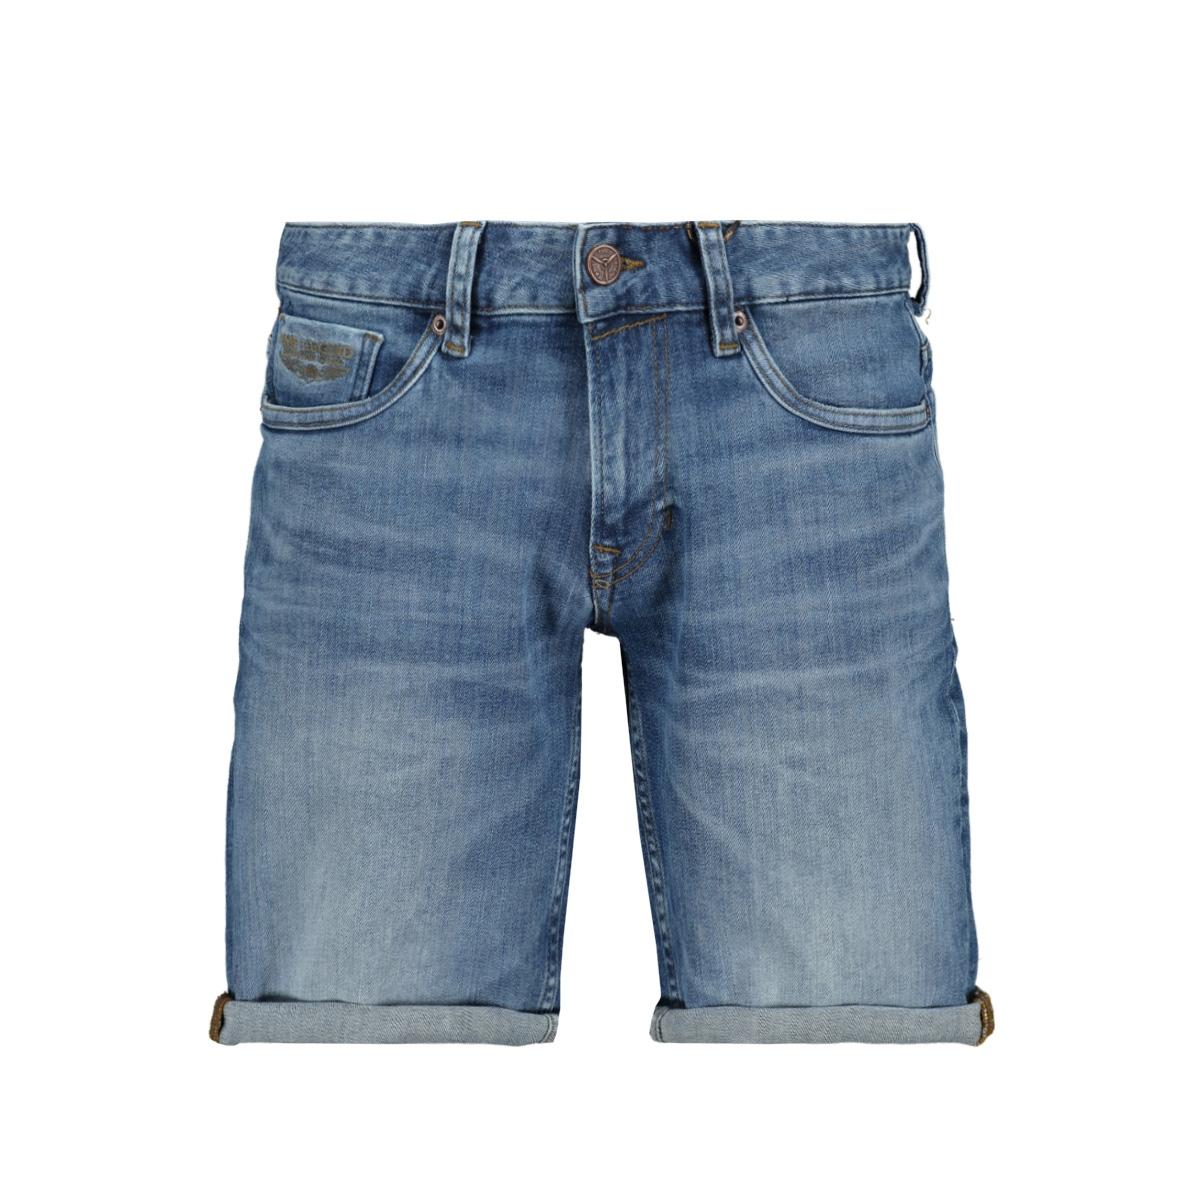 nightflight denim shorts psh150 pme legend korte broek mbc